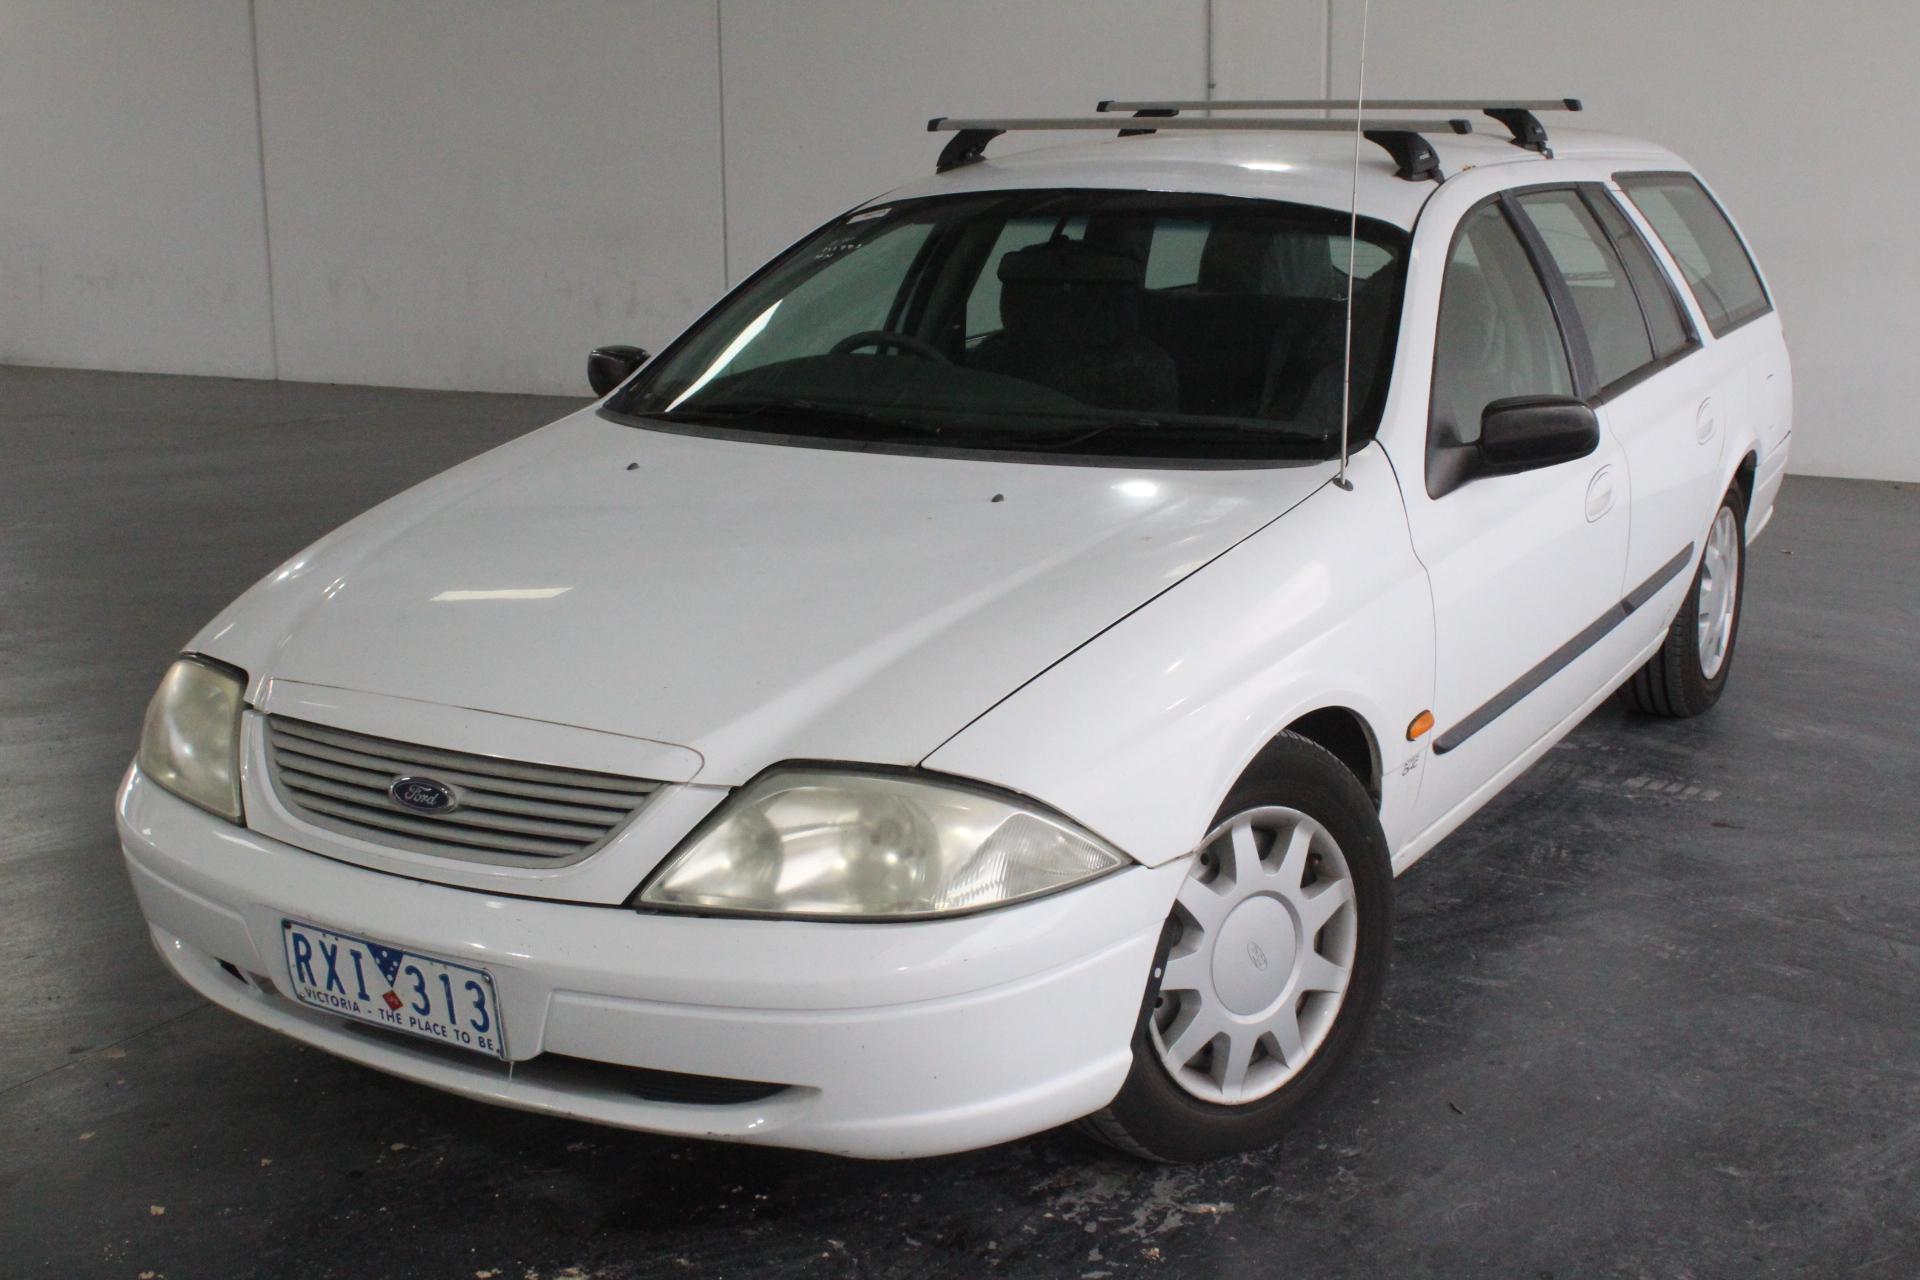 2001 Ford Falcon Forte AUII Automatic Wagon